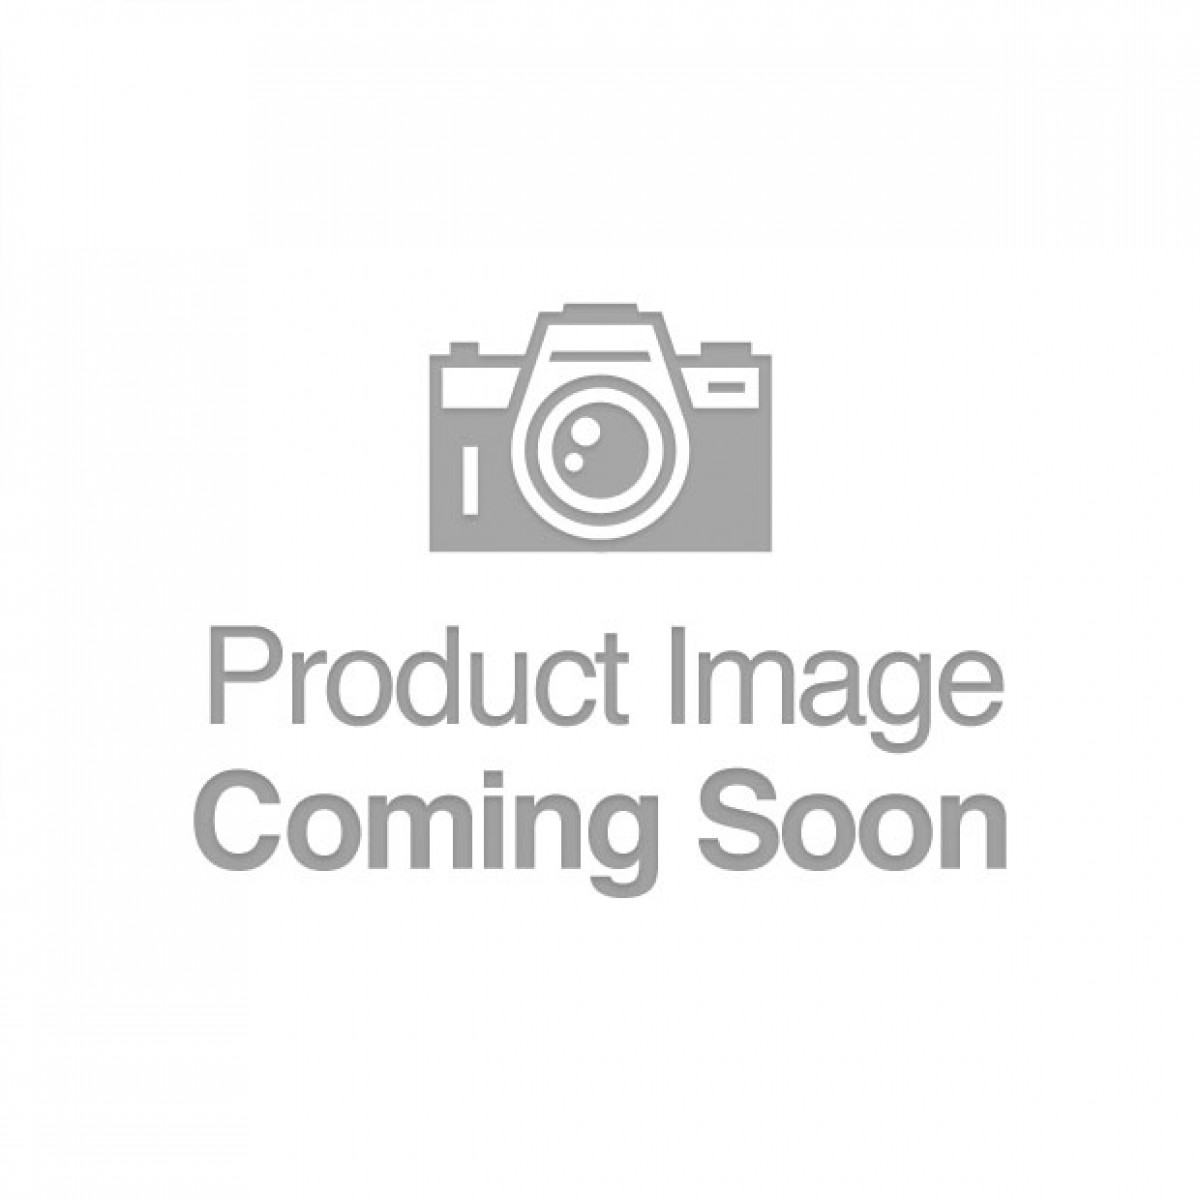 Kama Sutra Aromatic Oil - 8 Oz Harmony Blend